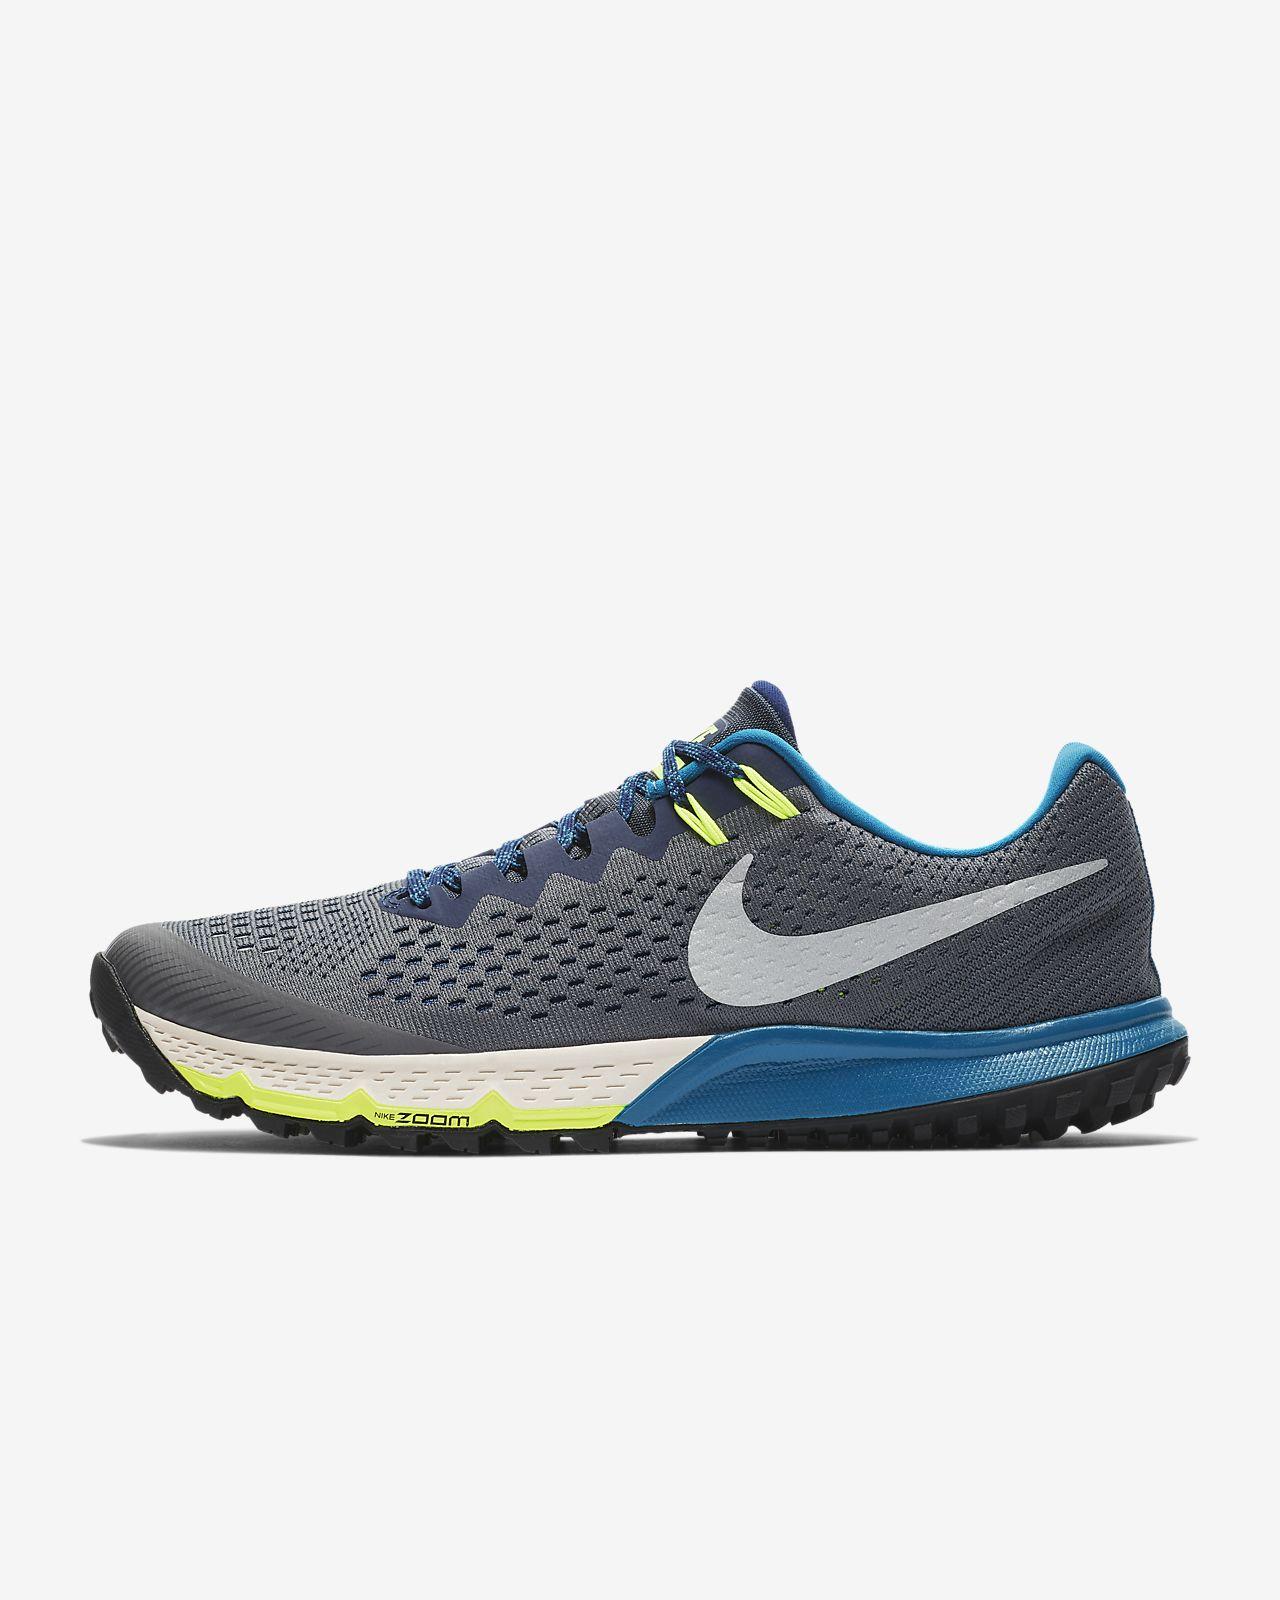 Chaussure de running Nike Air Zoom Terra Kiger 4 4 4 pour FR cf1055